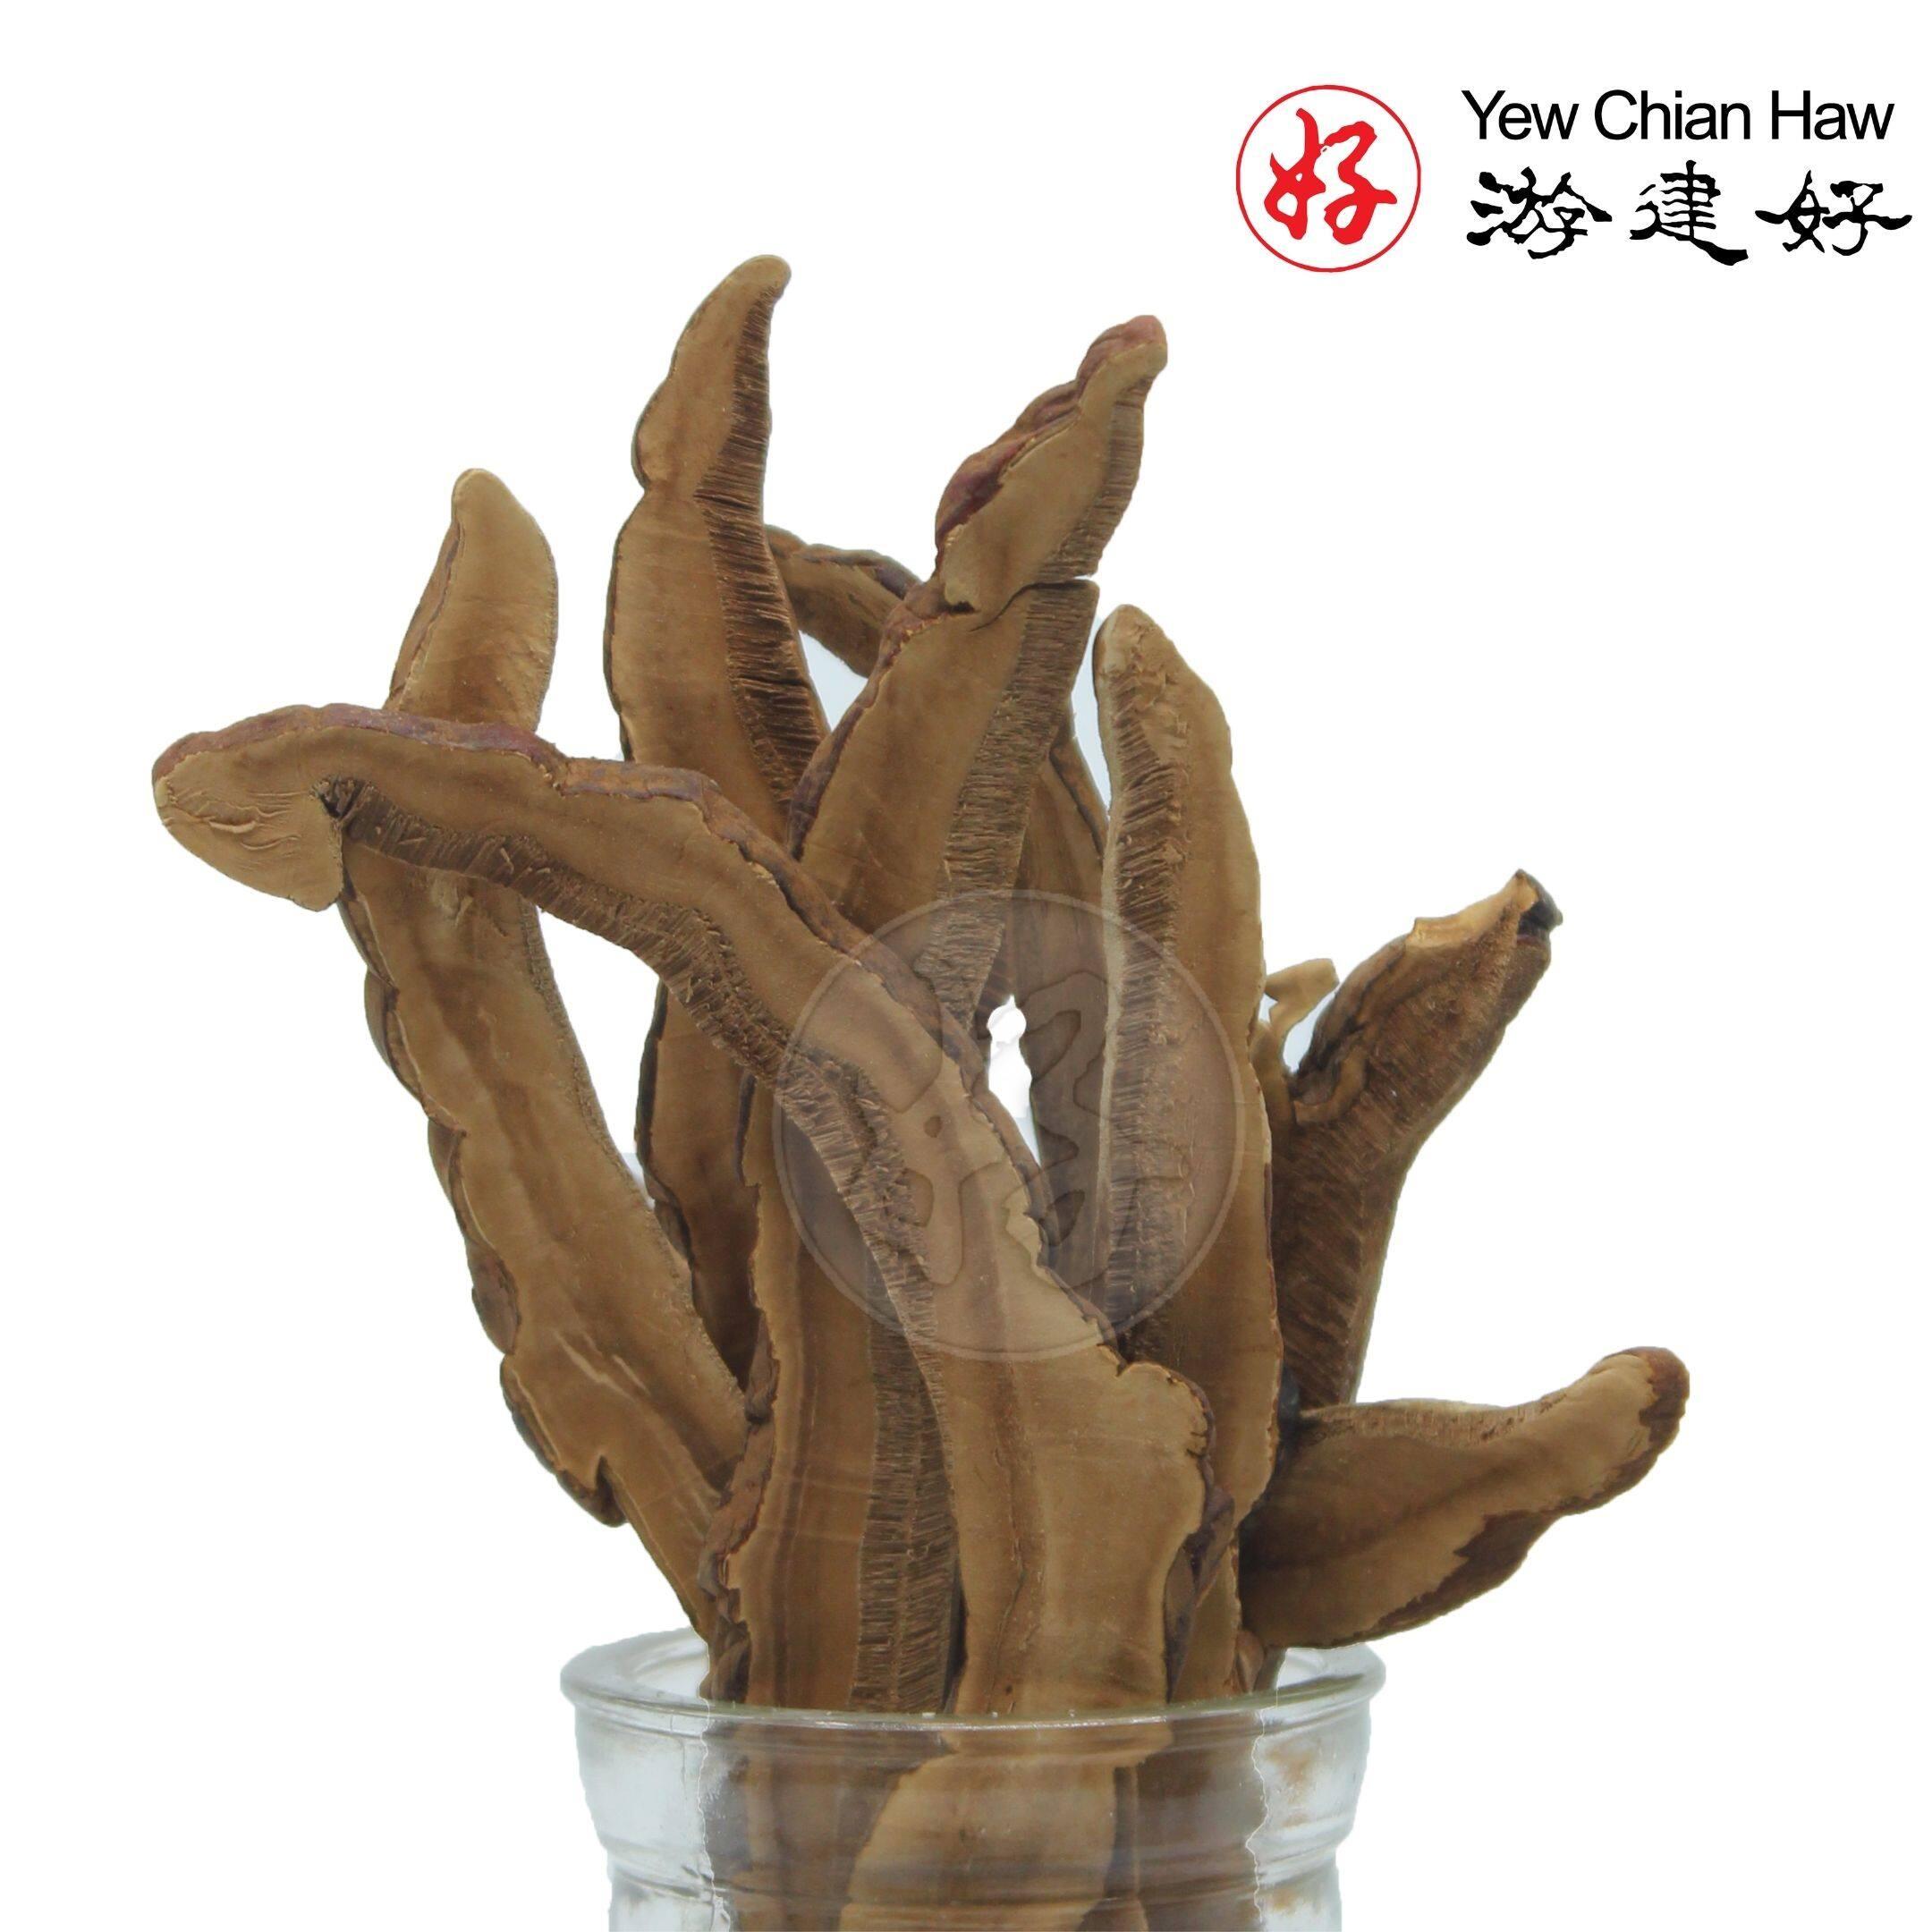 (22) YCH Herbs Jamur Ling Zhi/ Ganoderma Lingzhi / Reishi (22g Pack)HALAL